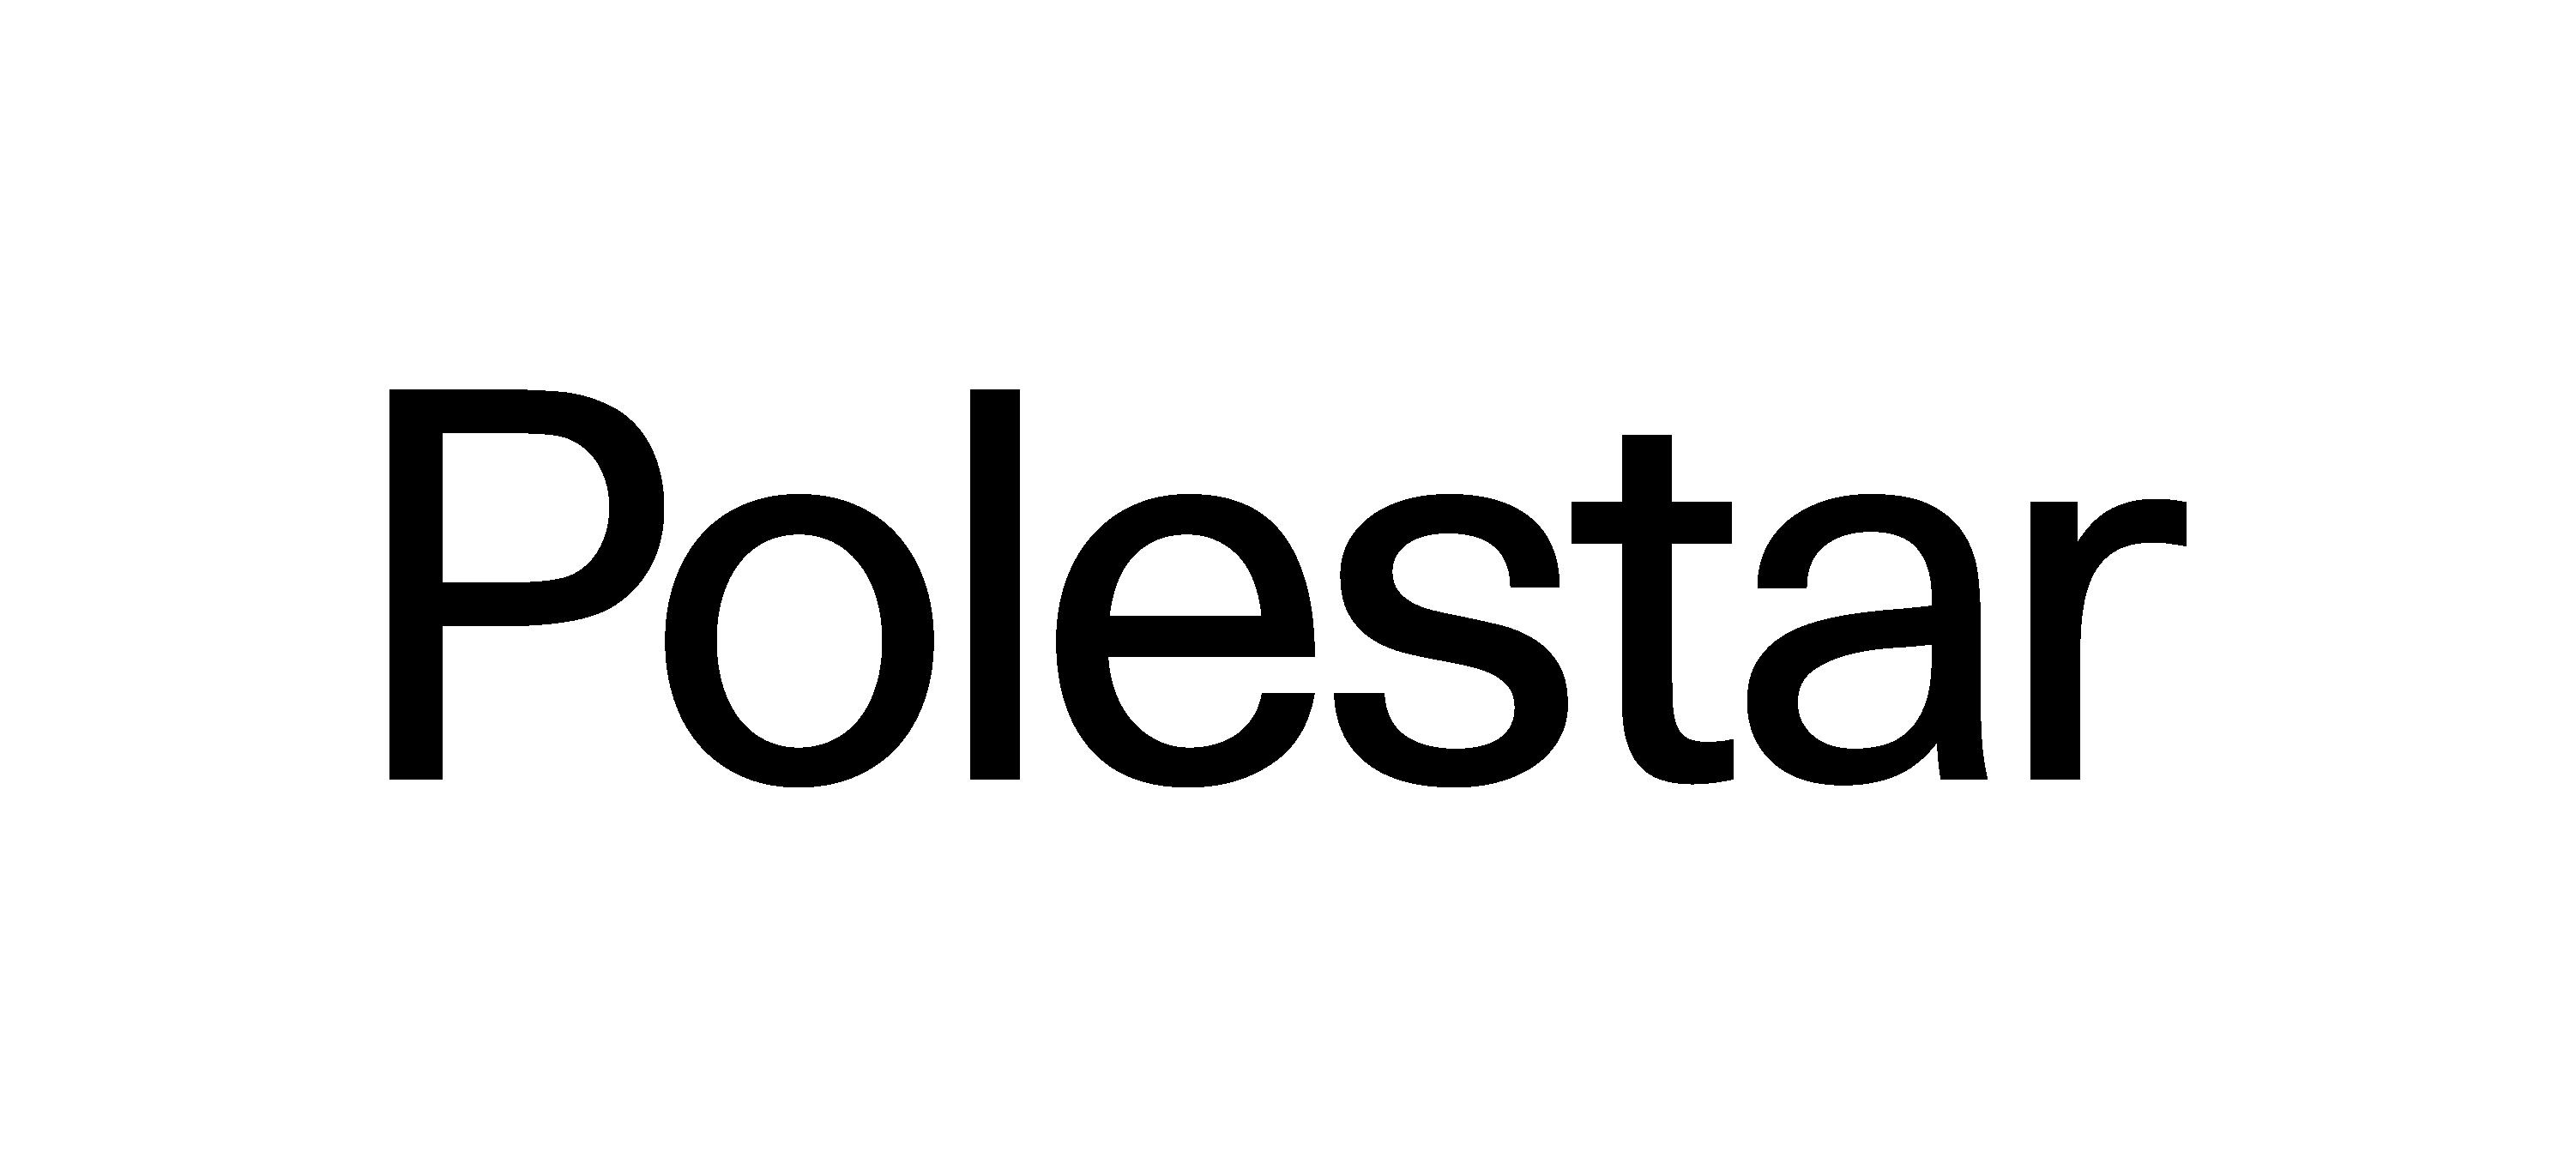 Polestar logo